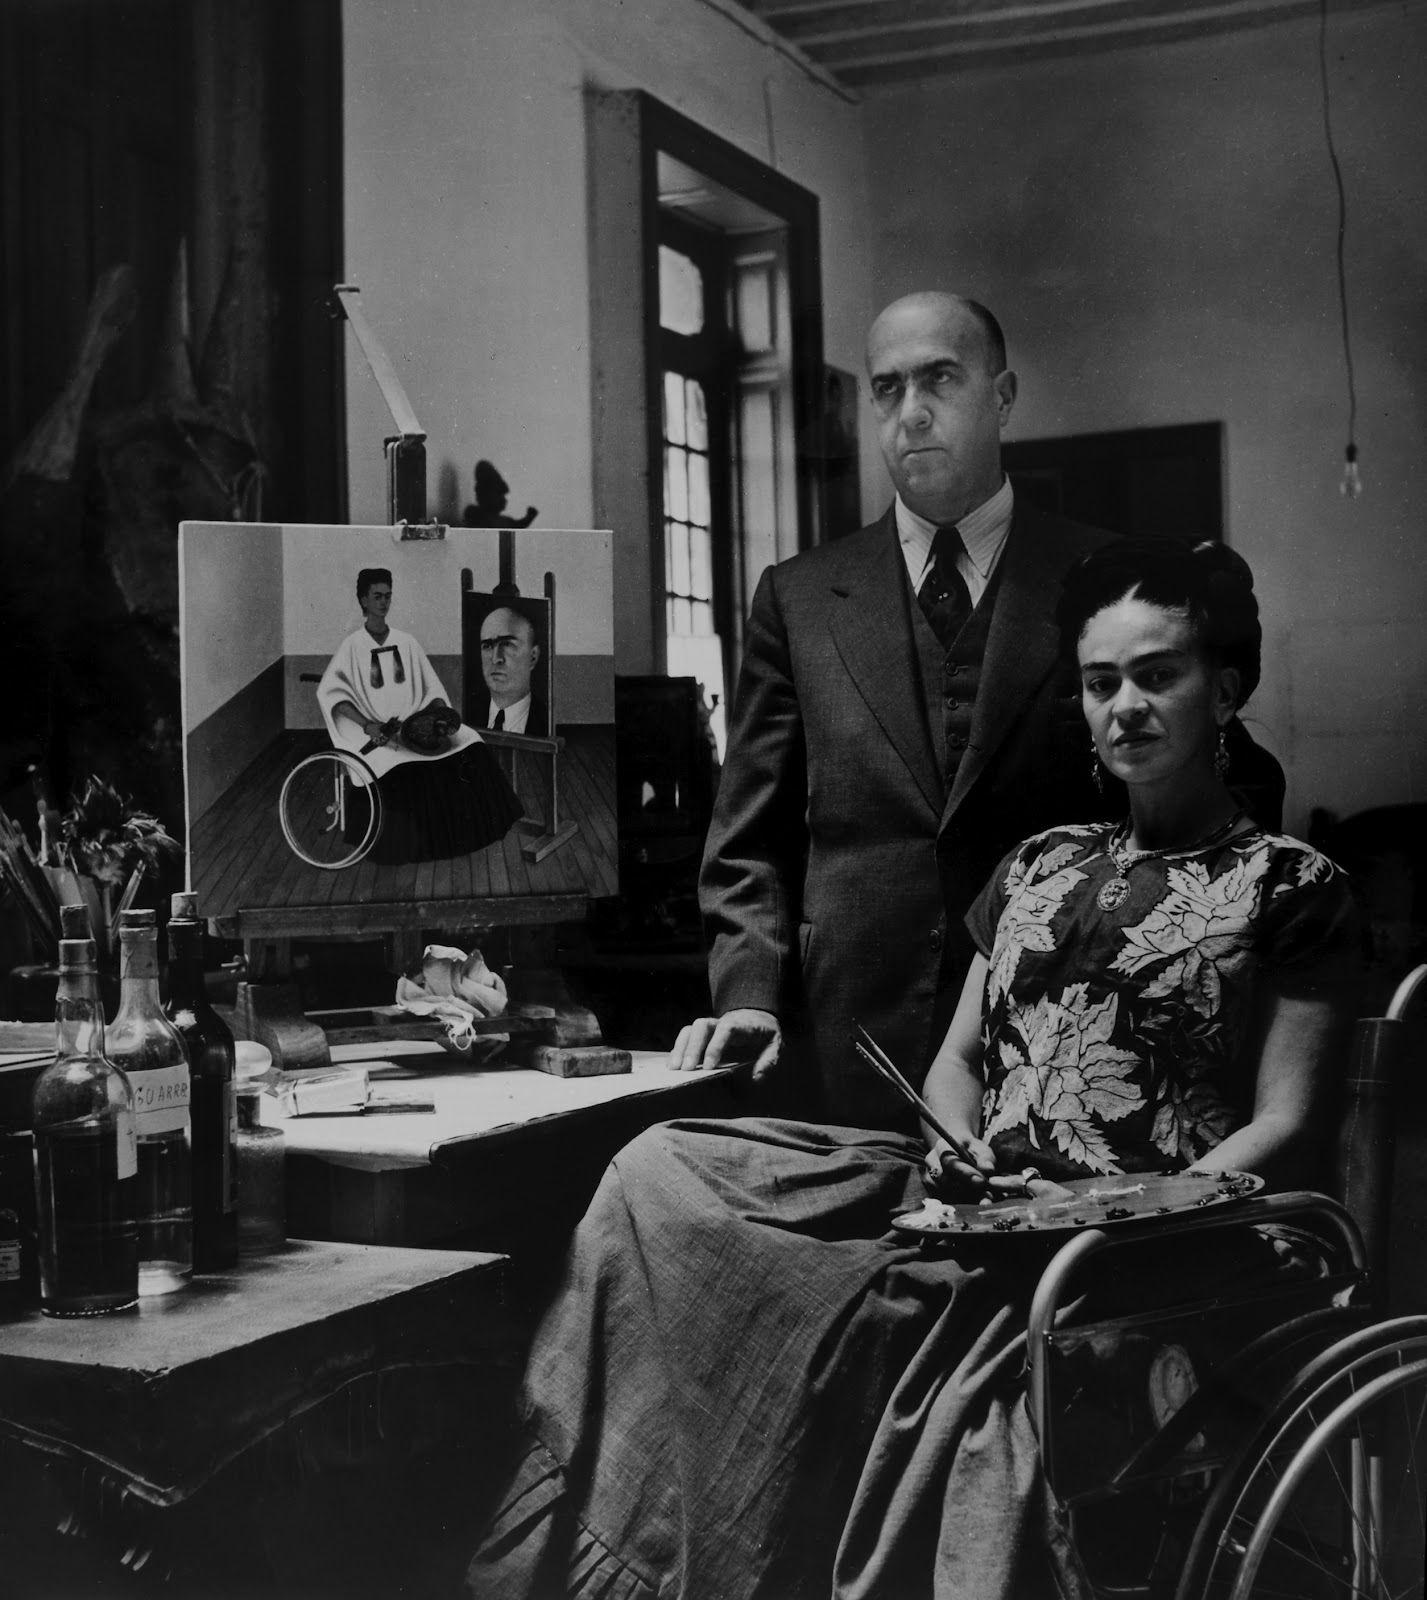 Frida Kahlo with Dr.Juan Farill, 1951. Author: Gisele Freund